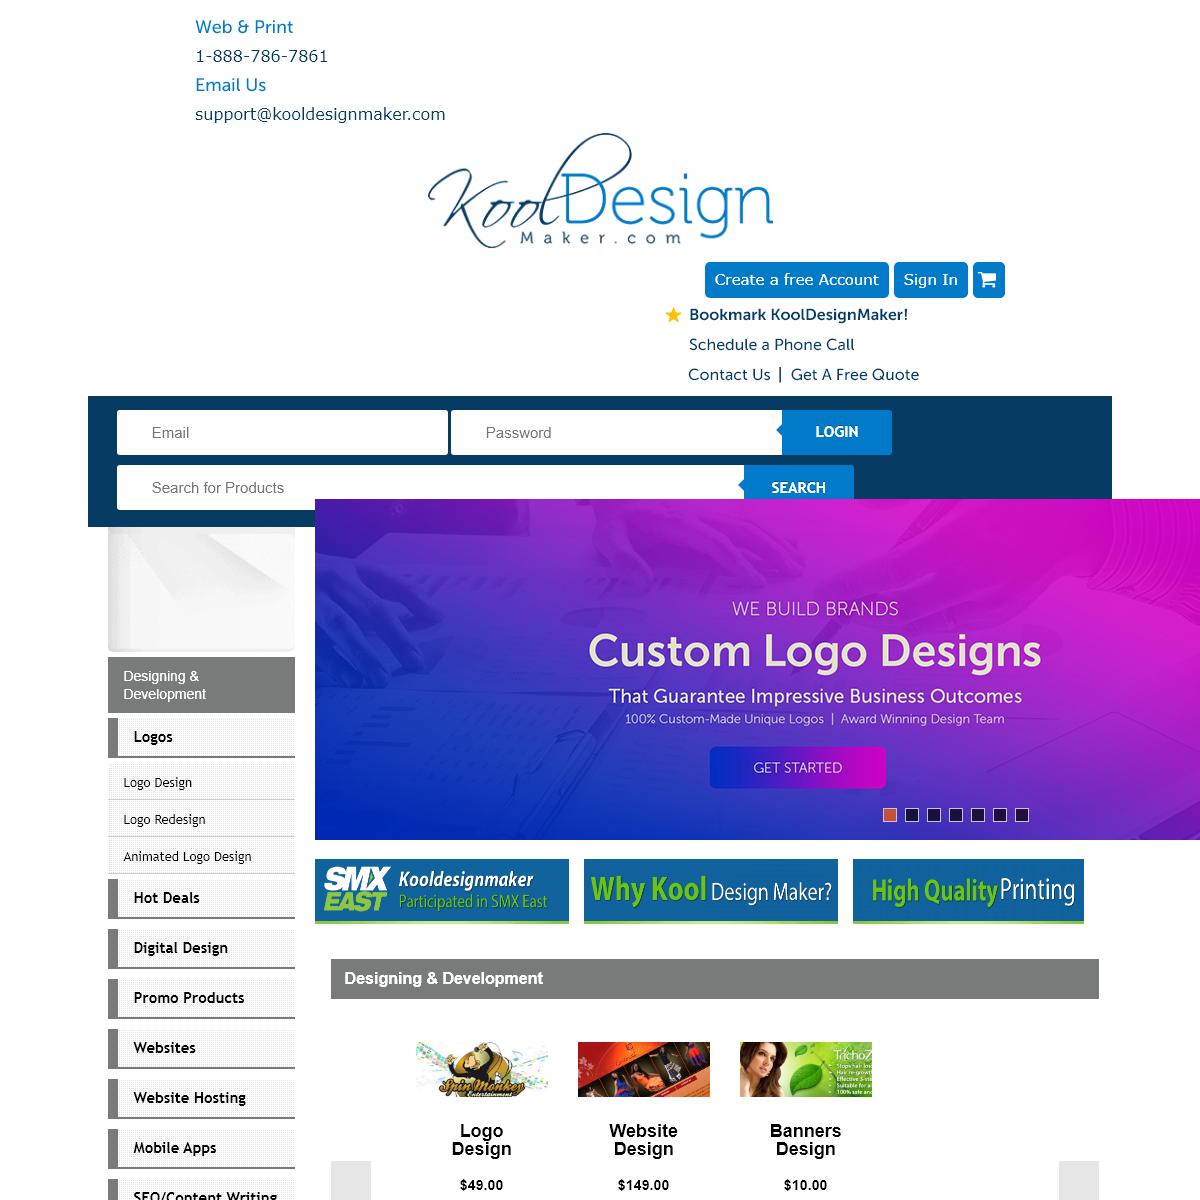 Online Printing Services - Business Cards, Postcards, Flyers, Logo Design& More